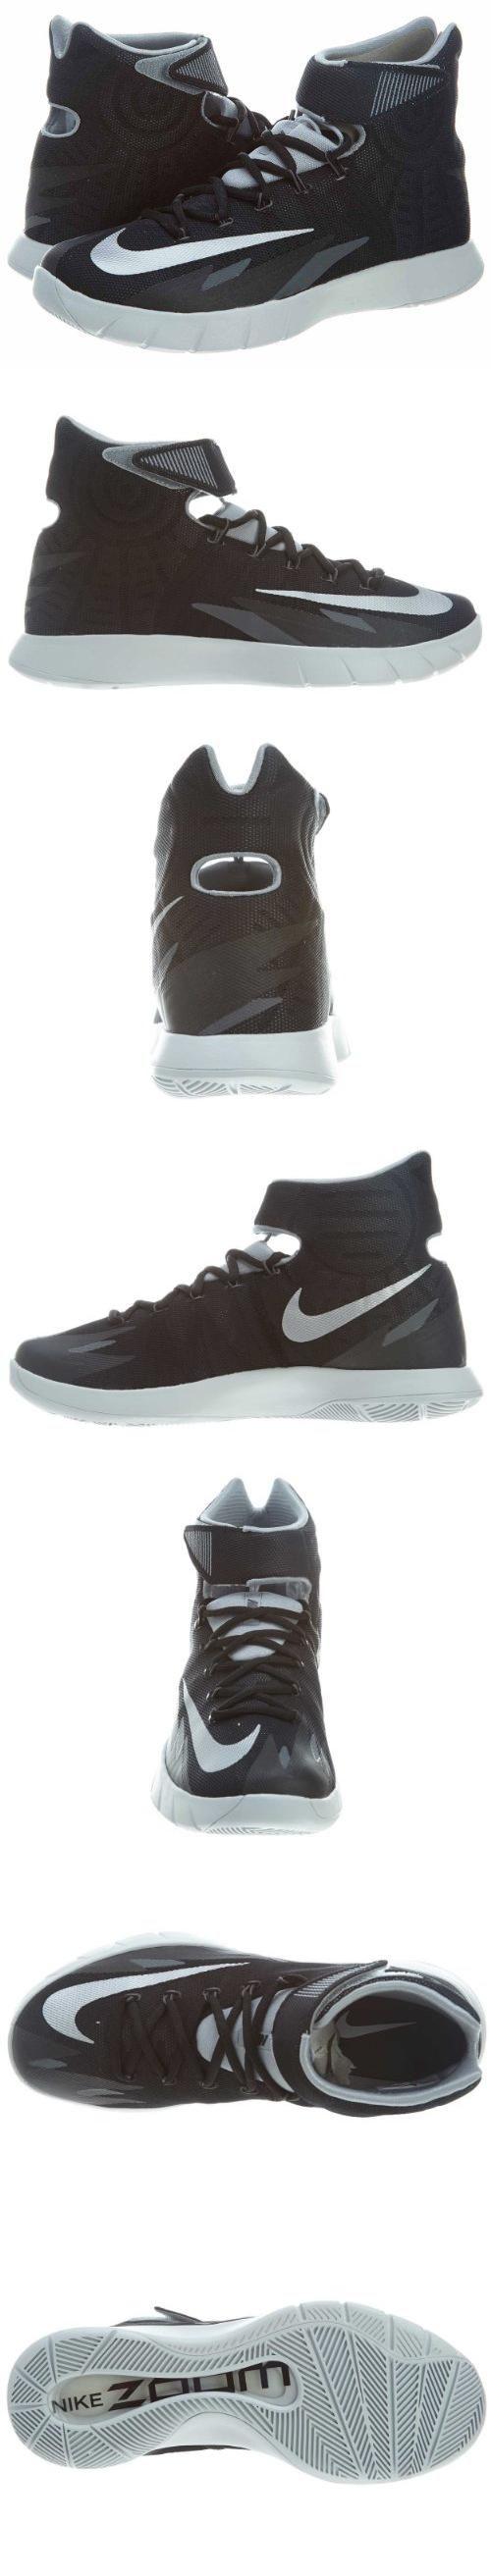 Nike Zoom Hyperrev Style: 630913-003 Size: 9, Nike Zoom Hyperrev,